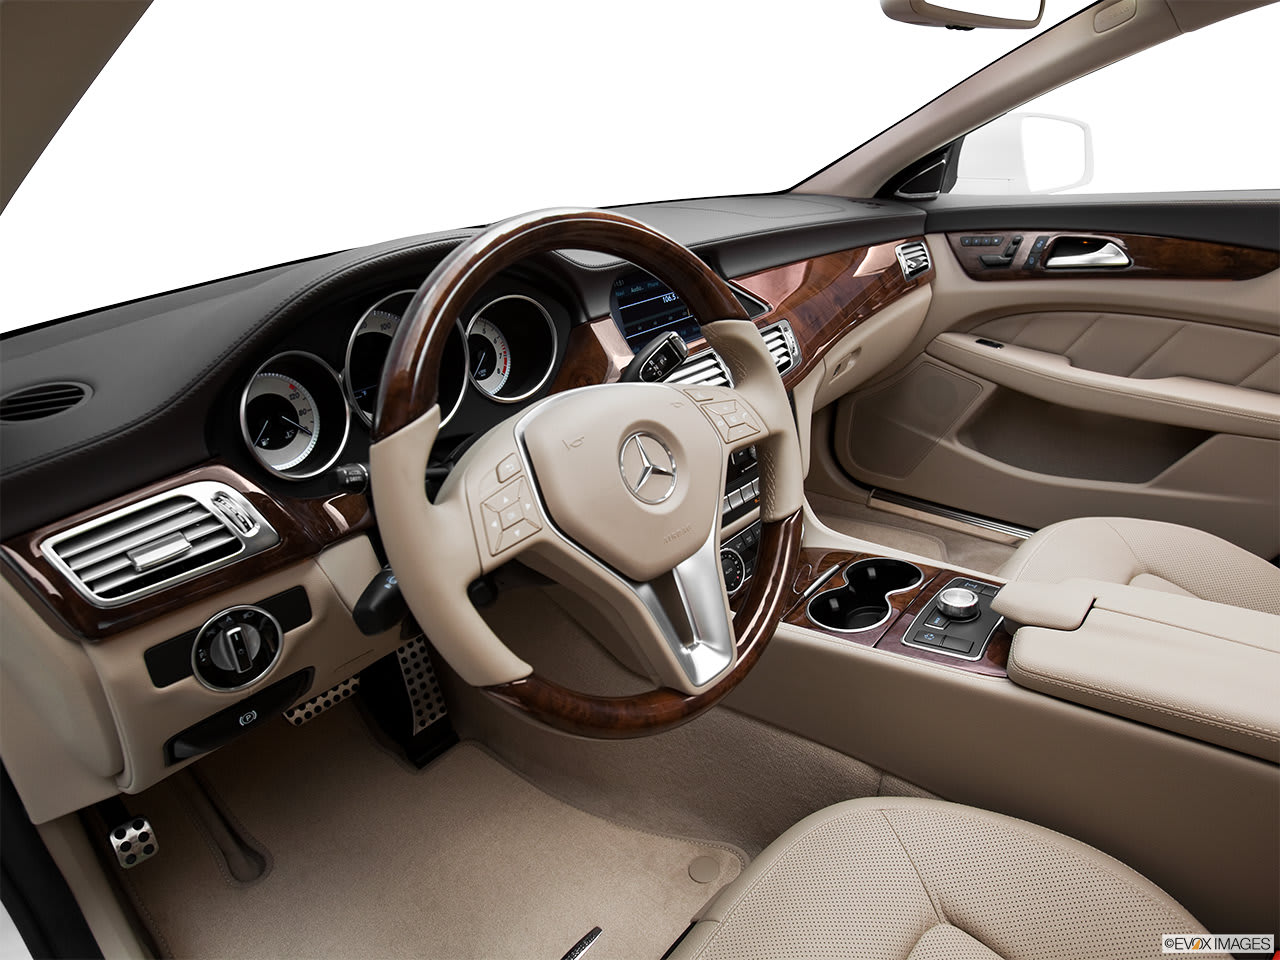 Mercedes-Benz CLS-Class 2012 Interior